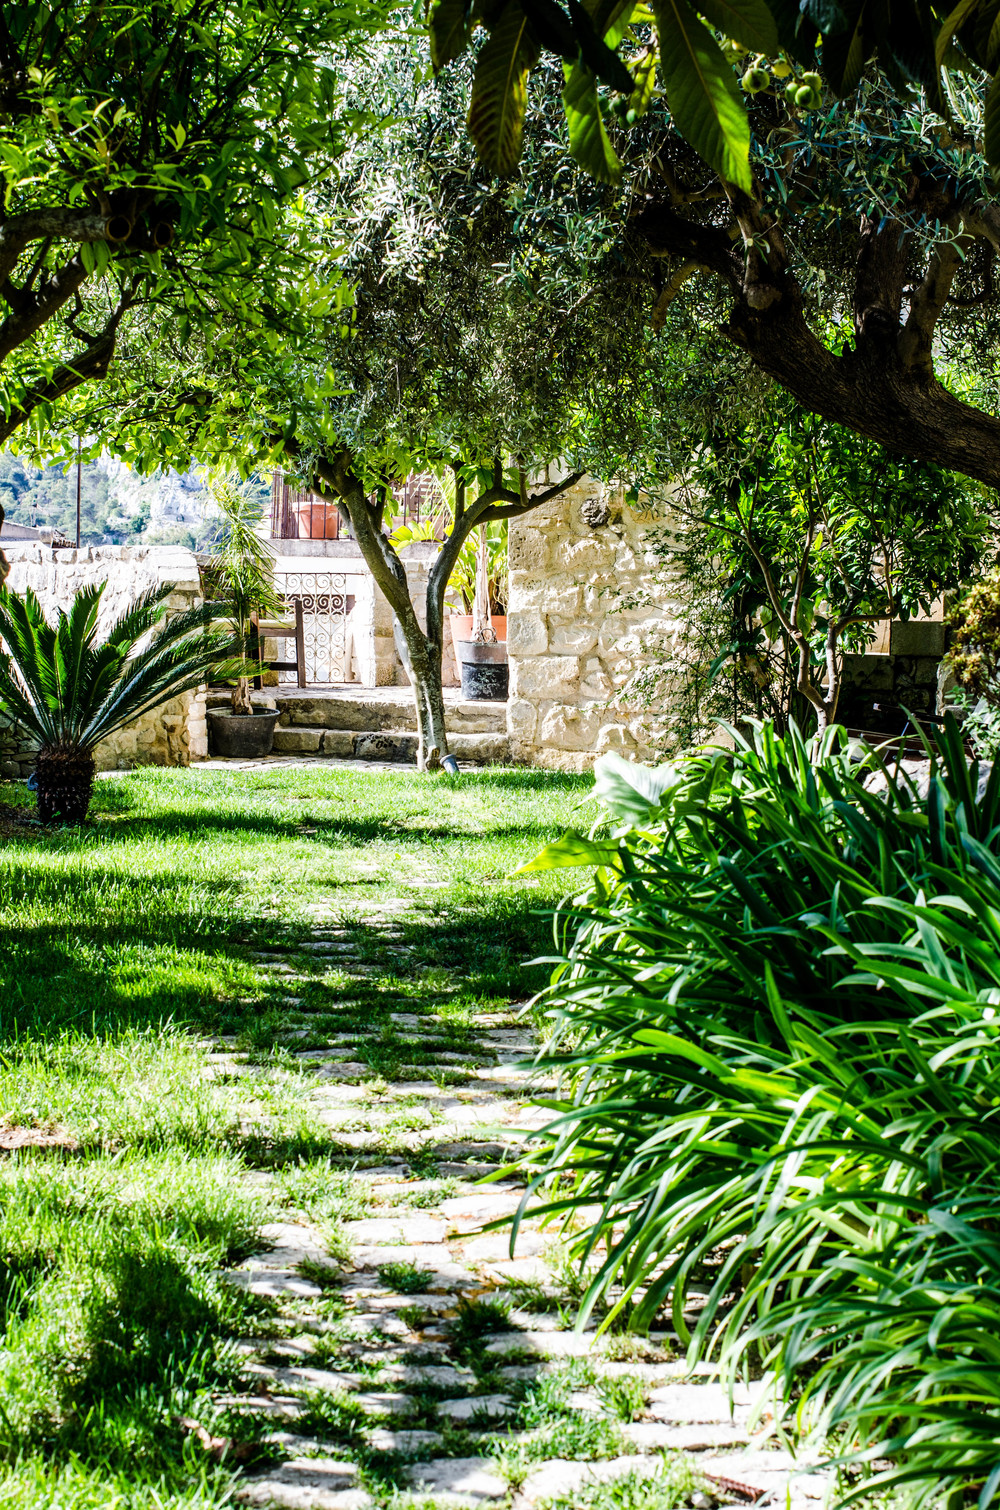 ROSE & IVY Journal Escape Casa Talia Modica Sicily